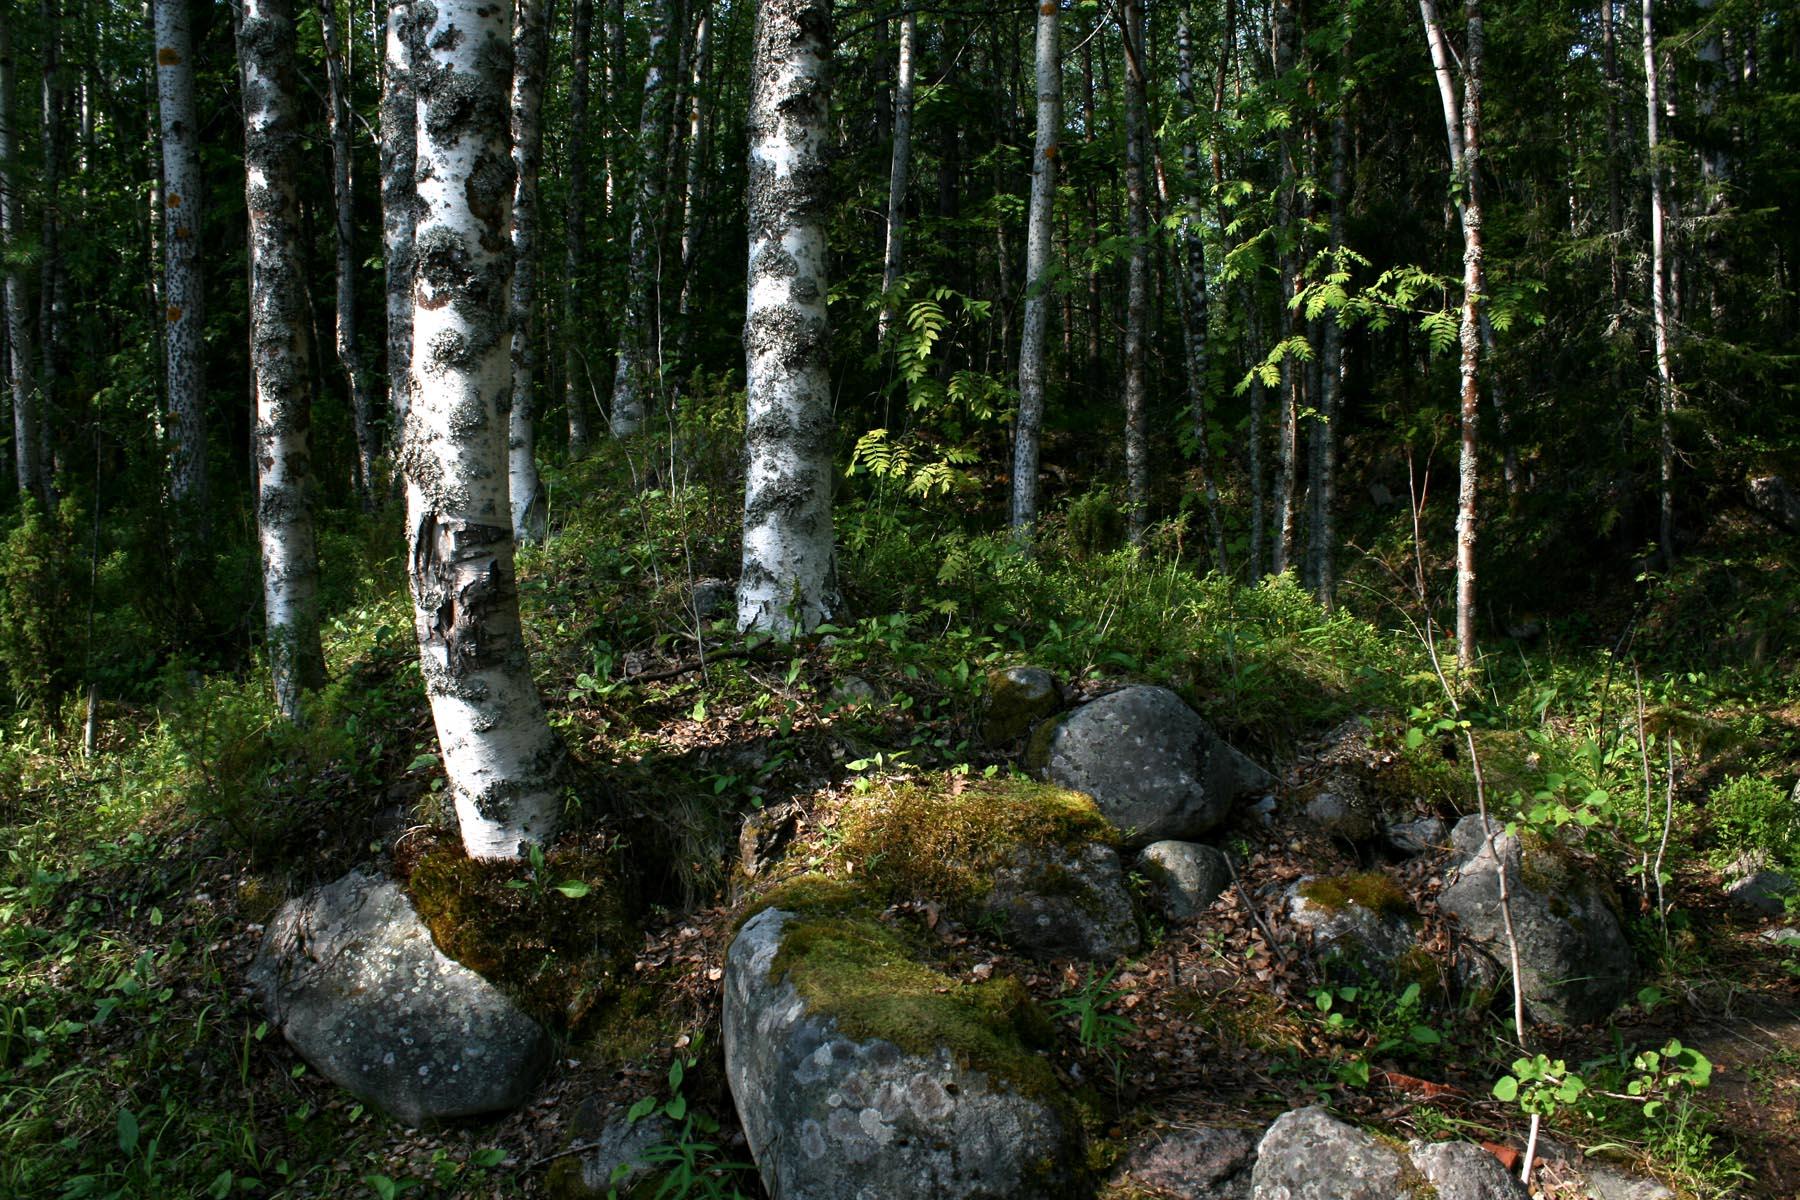 Березы на камнях